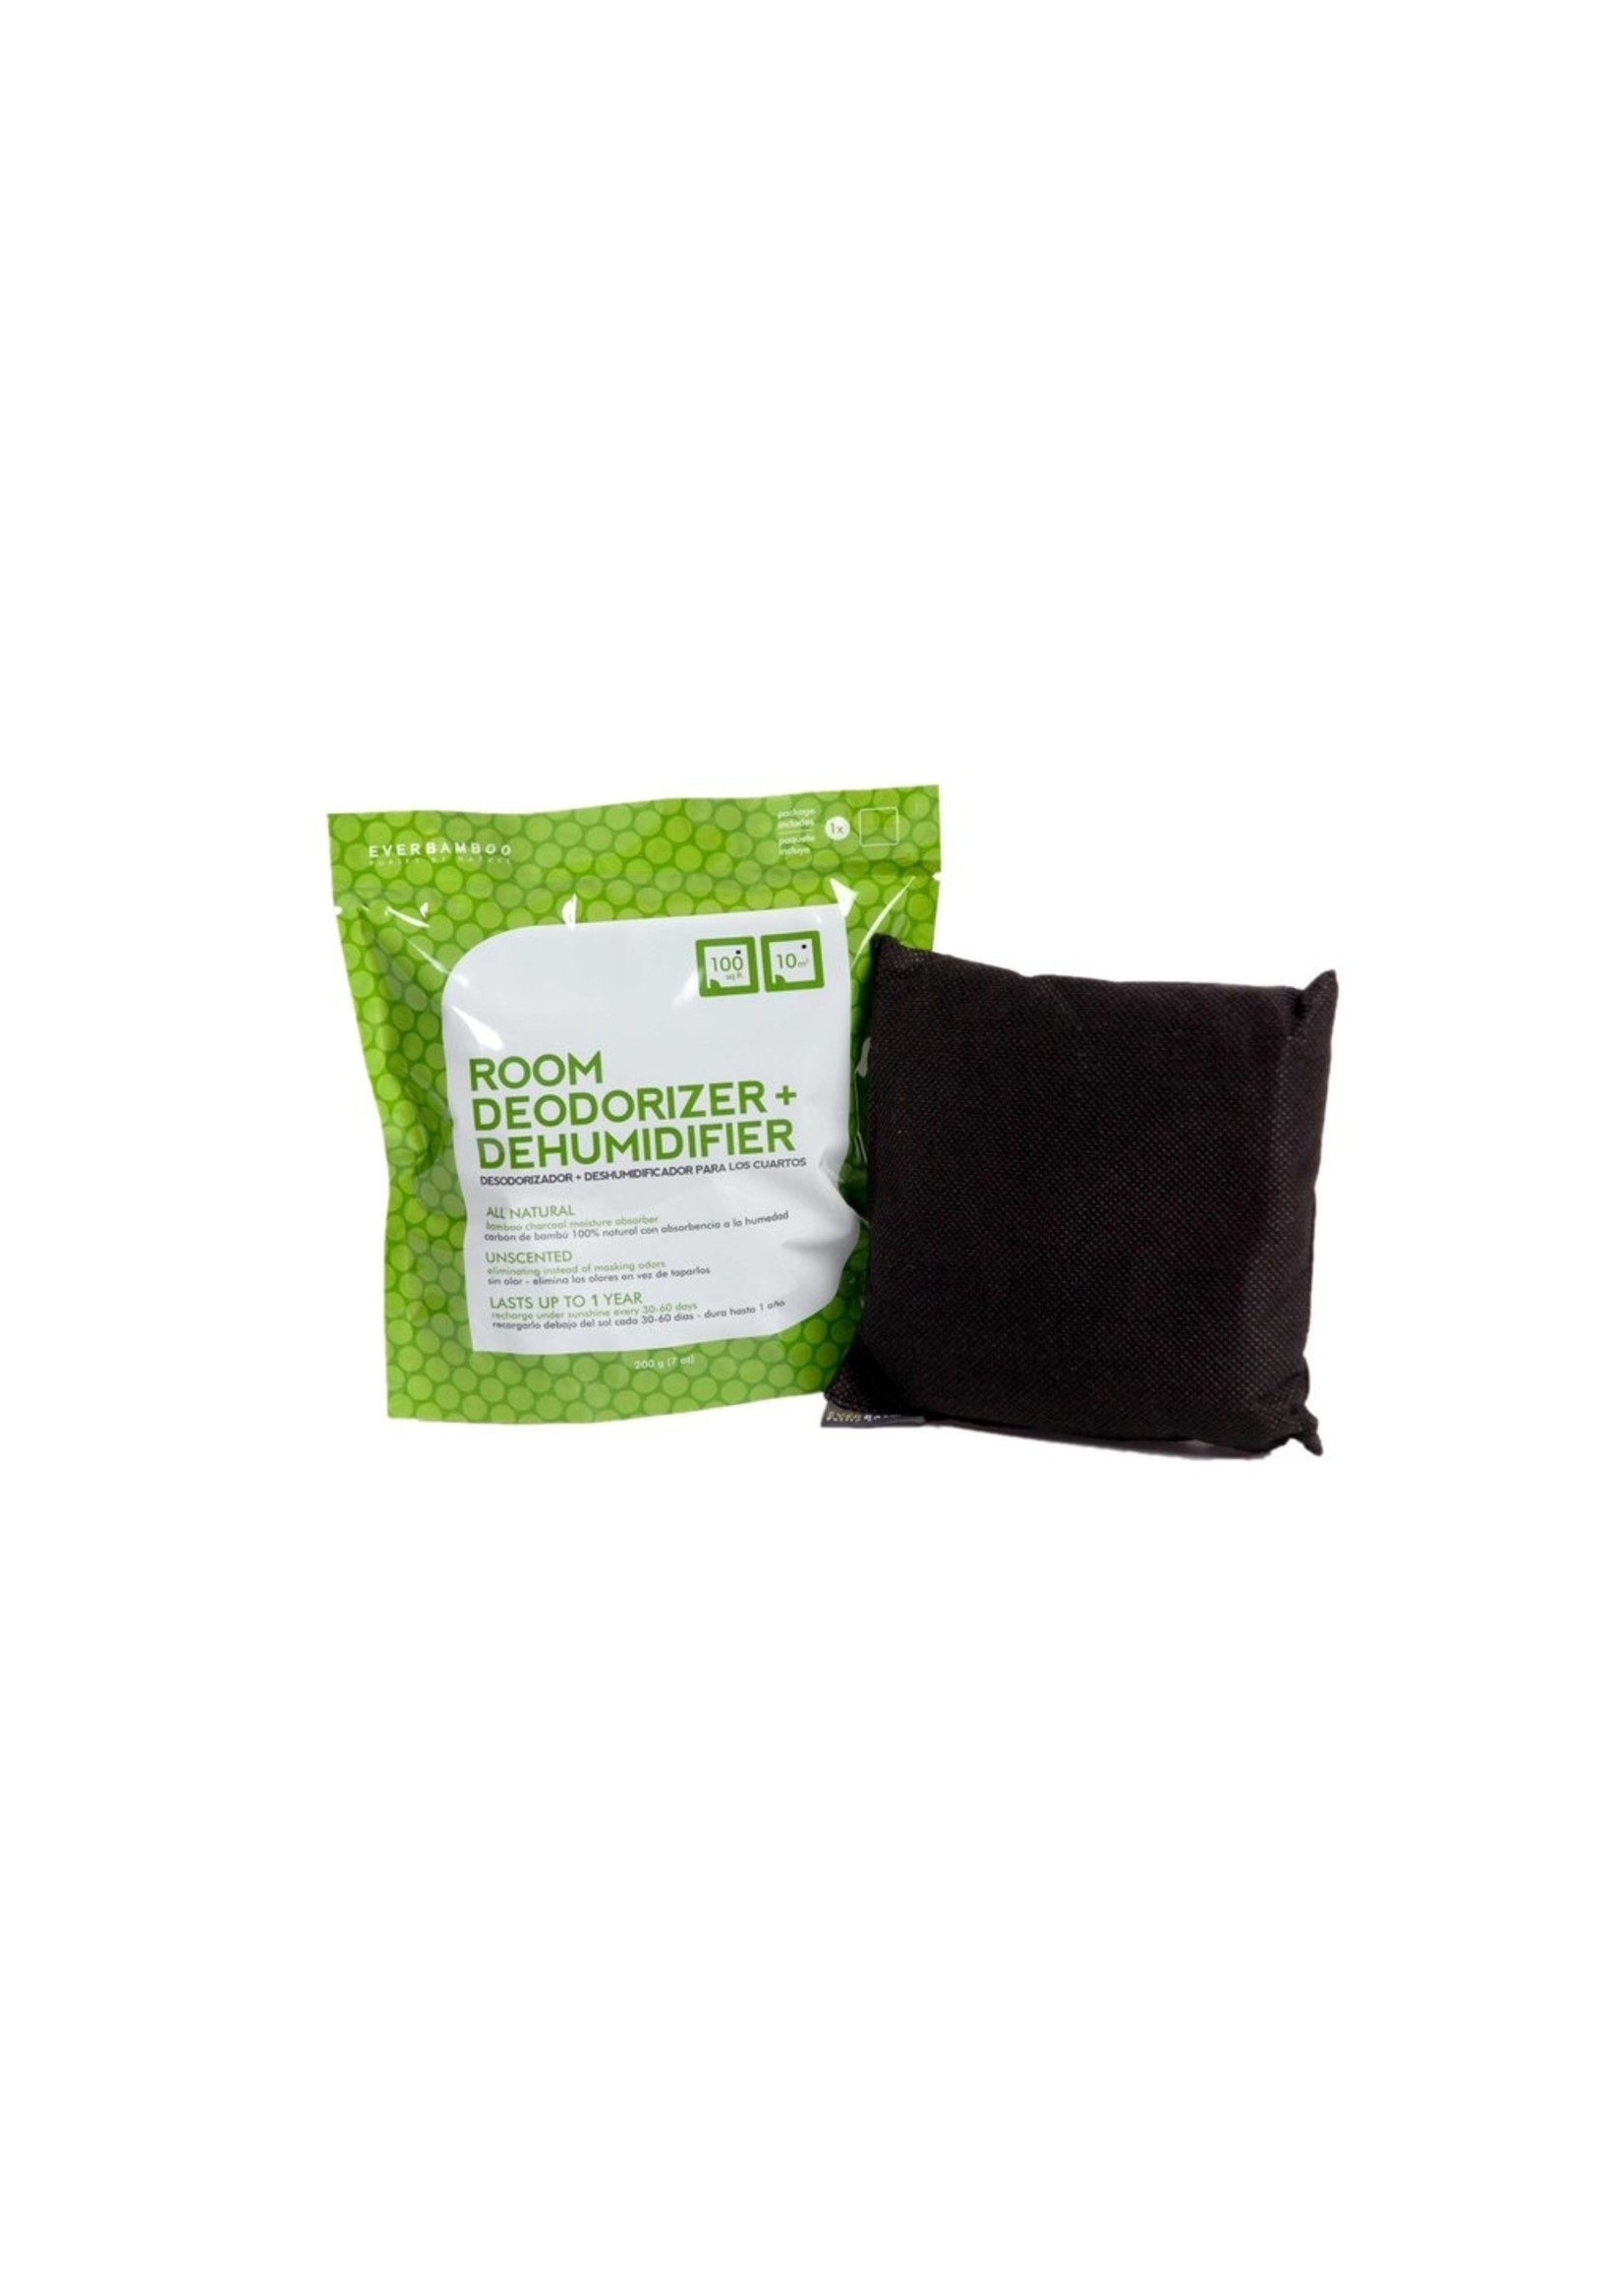 Ever BambooRoom Deodorizer + Dehumidifier Loose